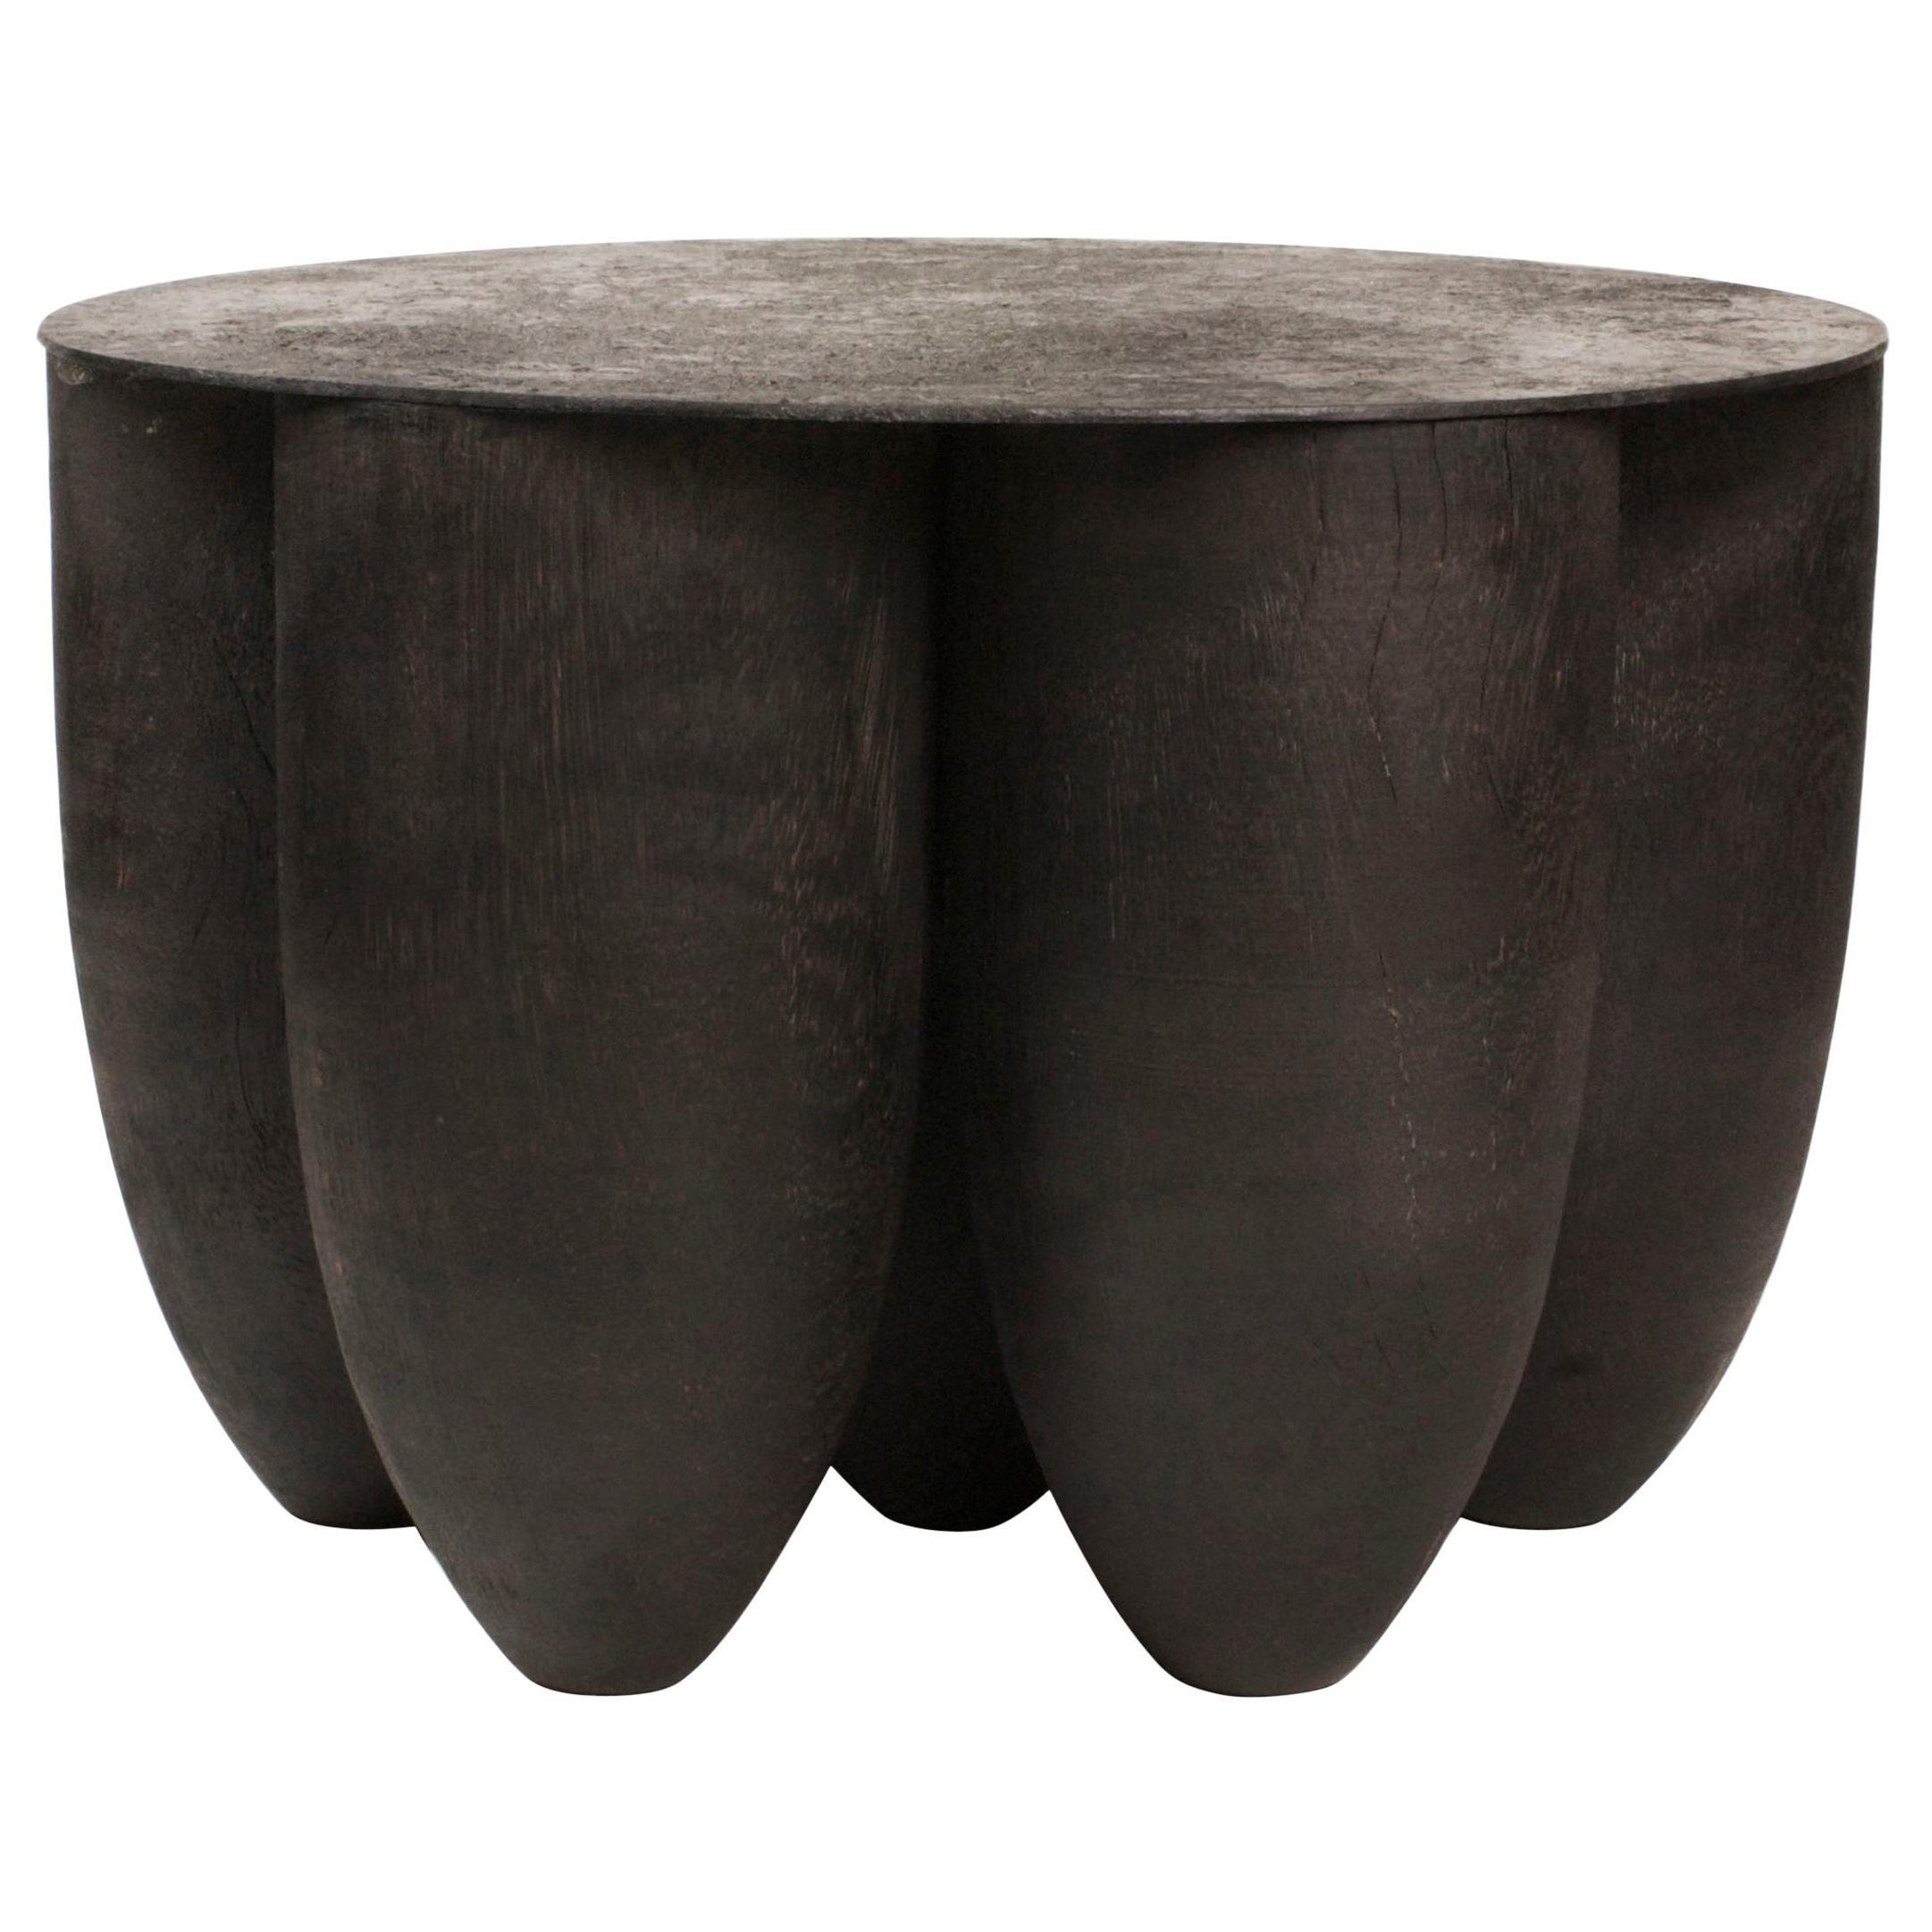 Senufo Coffee Table in Iroko Wood by Arno Declercq